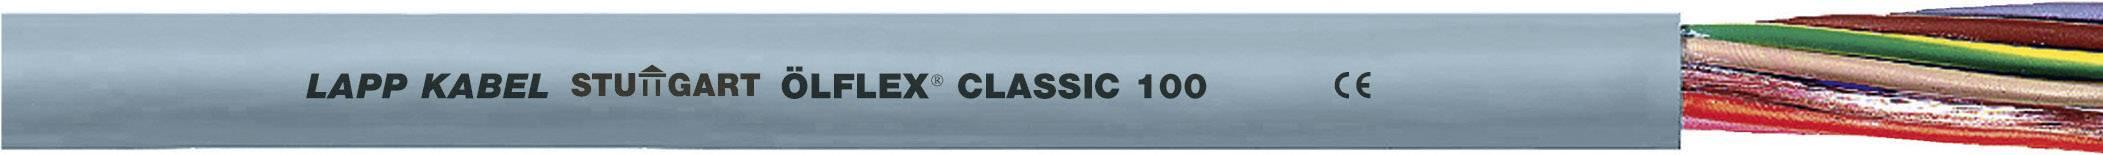 Kabel LappKabel Ölflex CLASSIC 100 6G0,5 (0010004), PVC, 6,7 mm, 500 V, šedá, 100 m